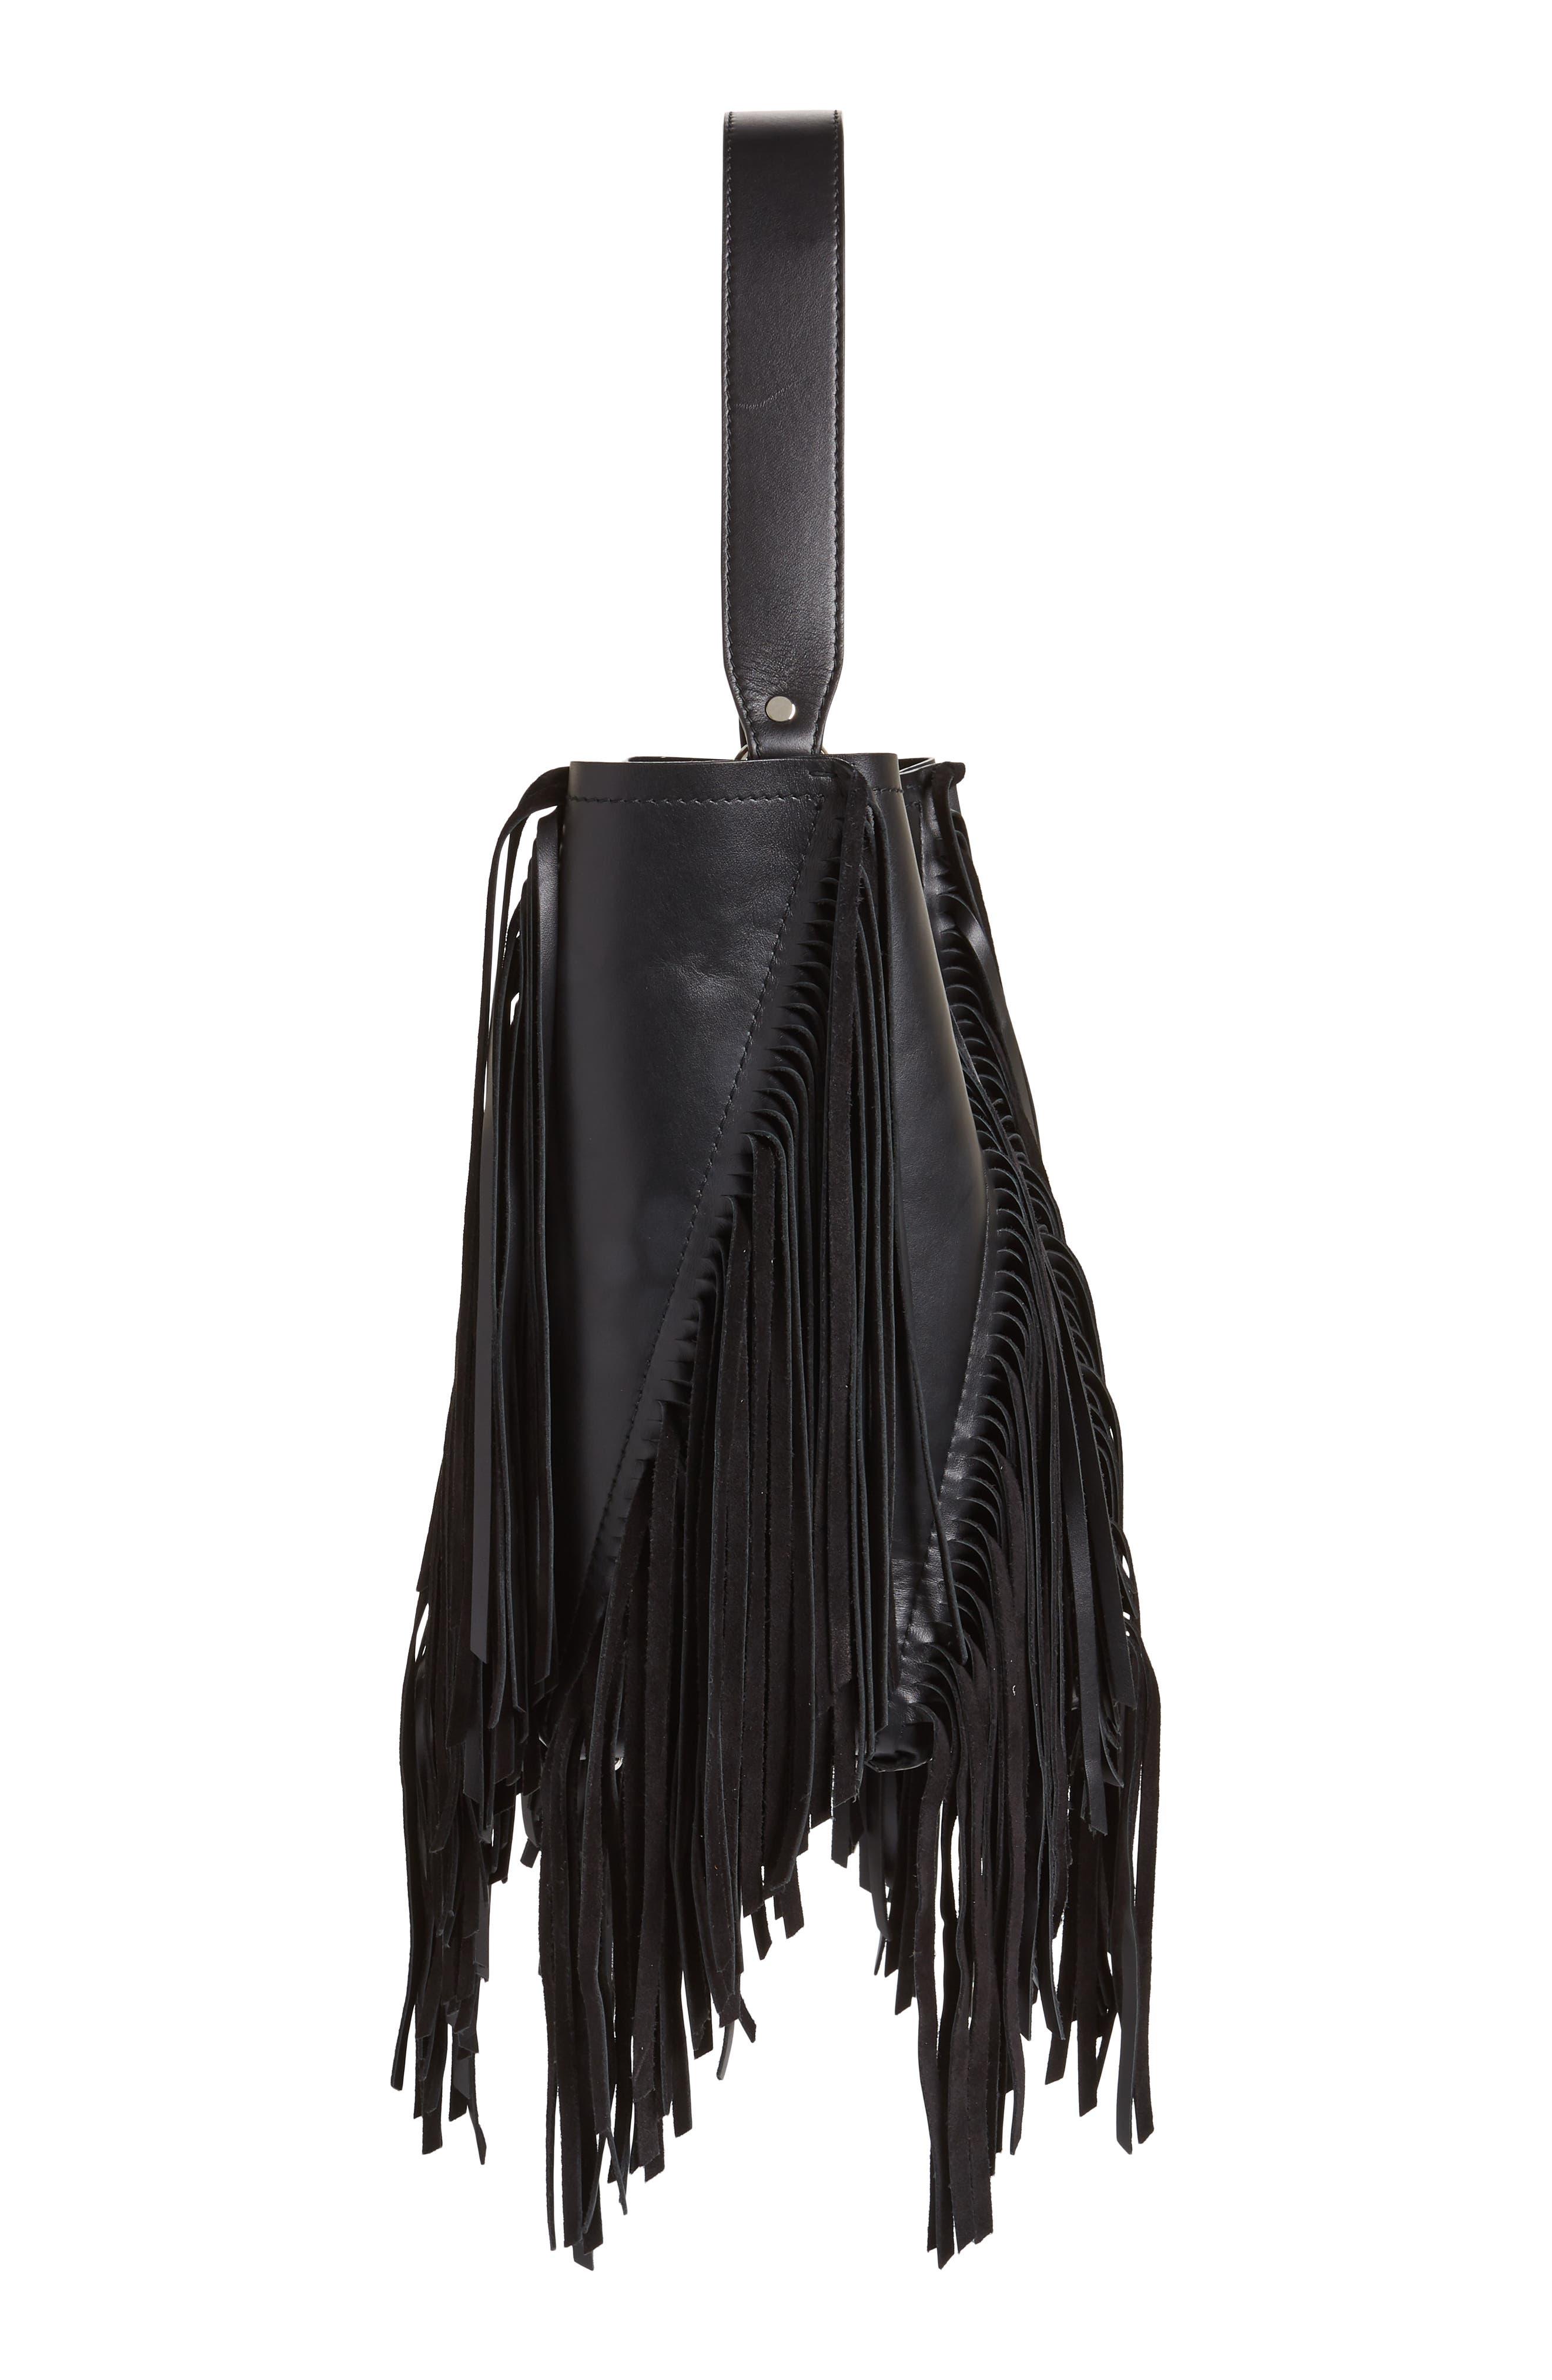 PROENZA SCHOULER, Medium Hex Fringe Calfskin Leather Bucket Bag, Alternate thumbnail 5, color, BLACK/ BLACK